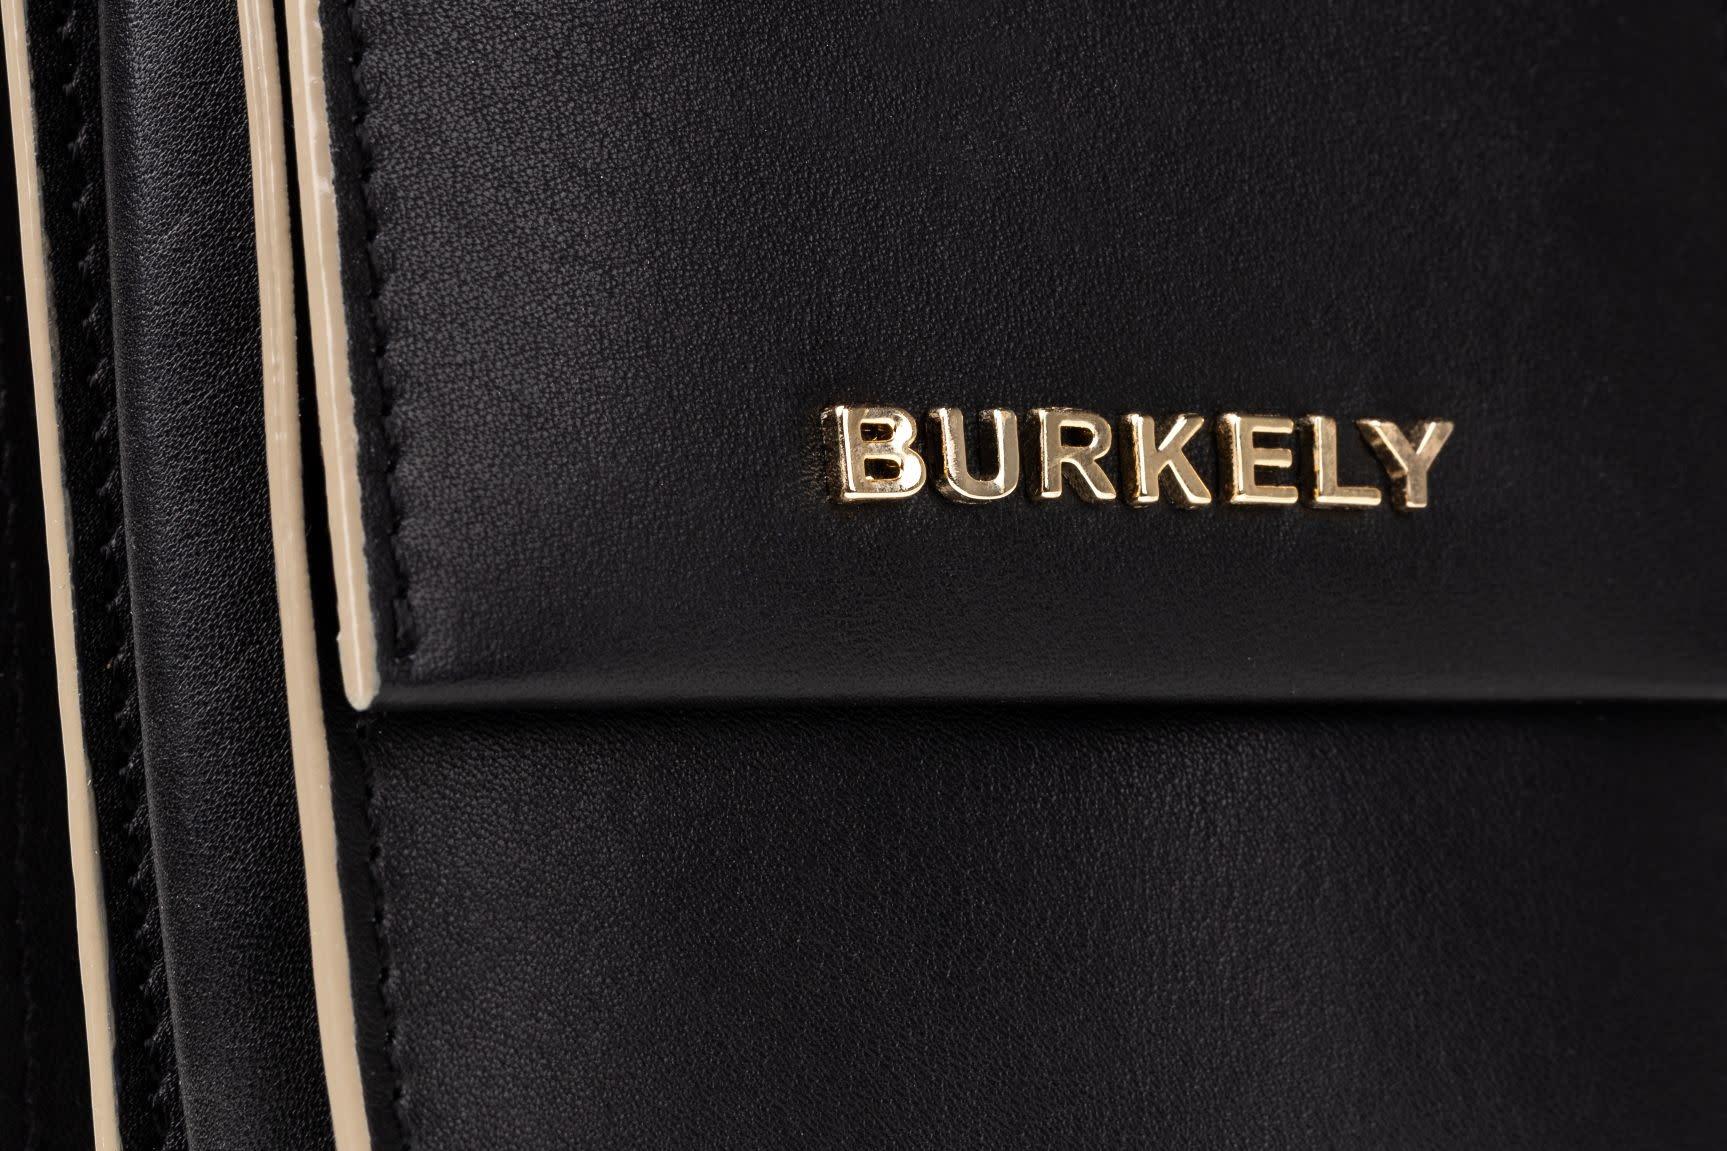 Burkely Parisian Paige - Shoulderbag - zwart